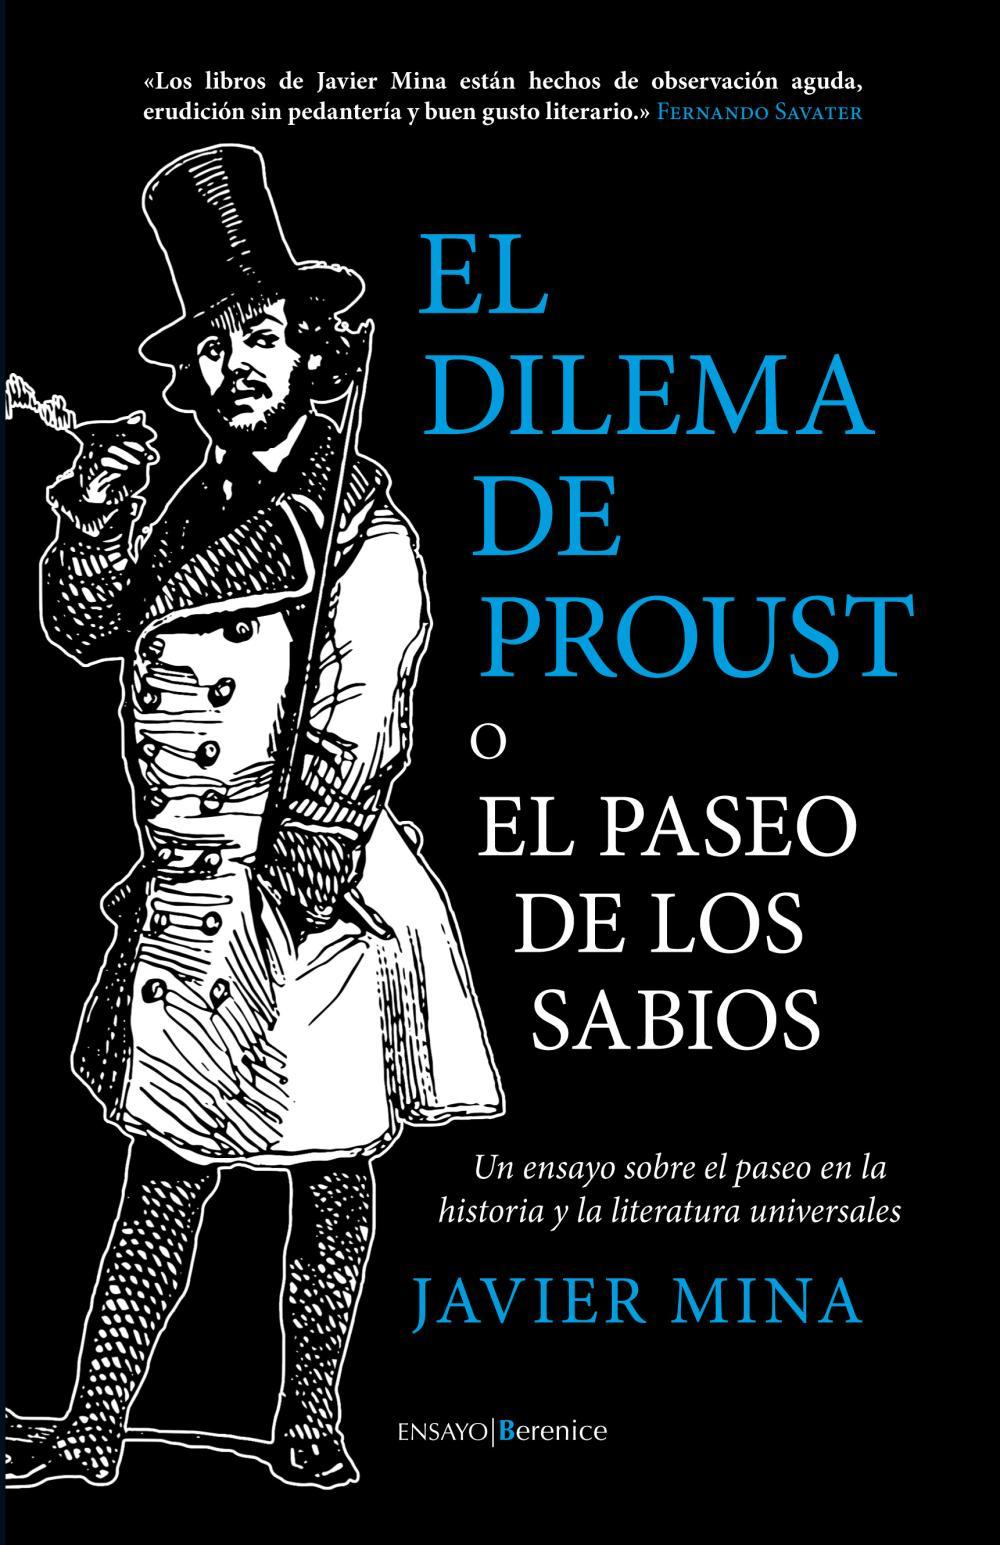 El dilema de Proust o el paseo de los sabios